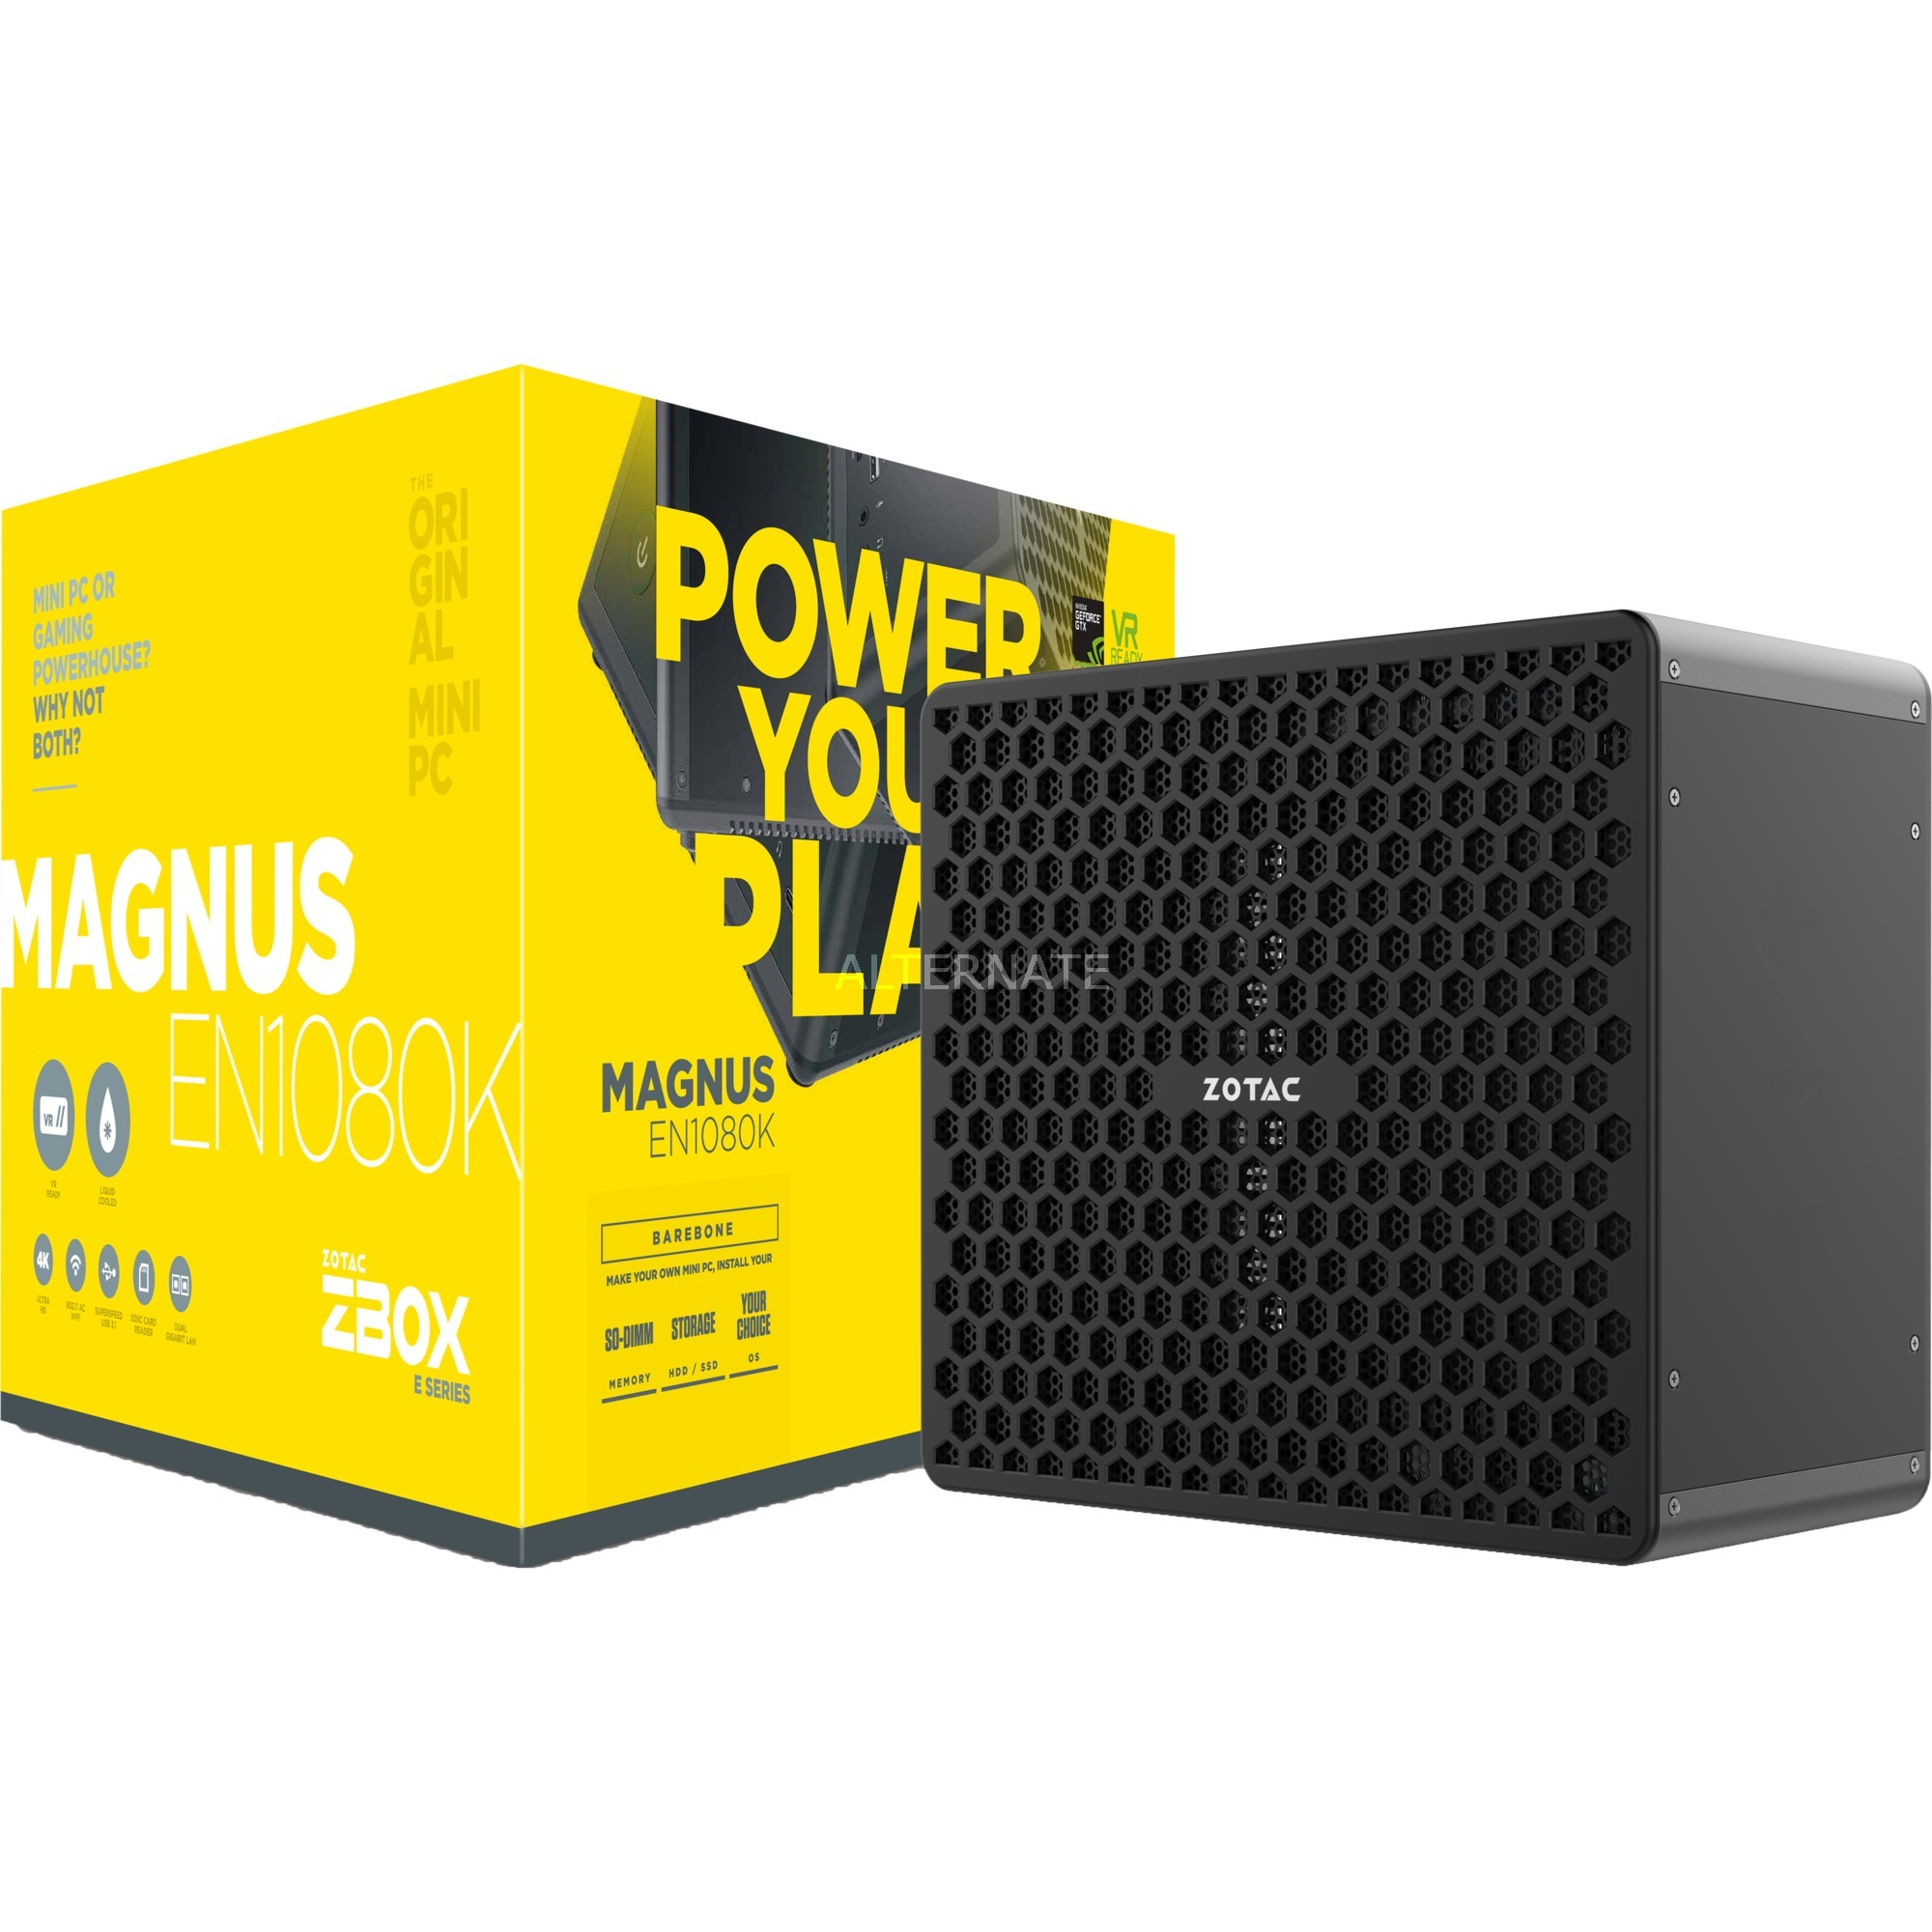 Magnus EN1080K 3,6 GHz i7-7700 Negro LGA 1151 (Zócalo H4), Barebone